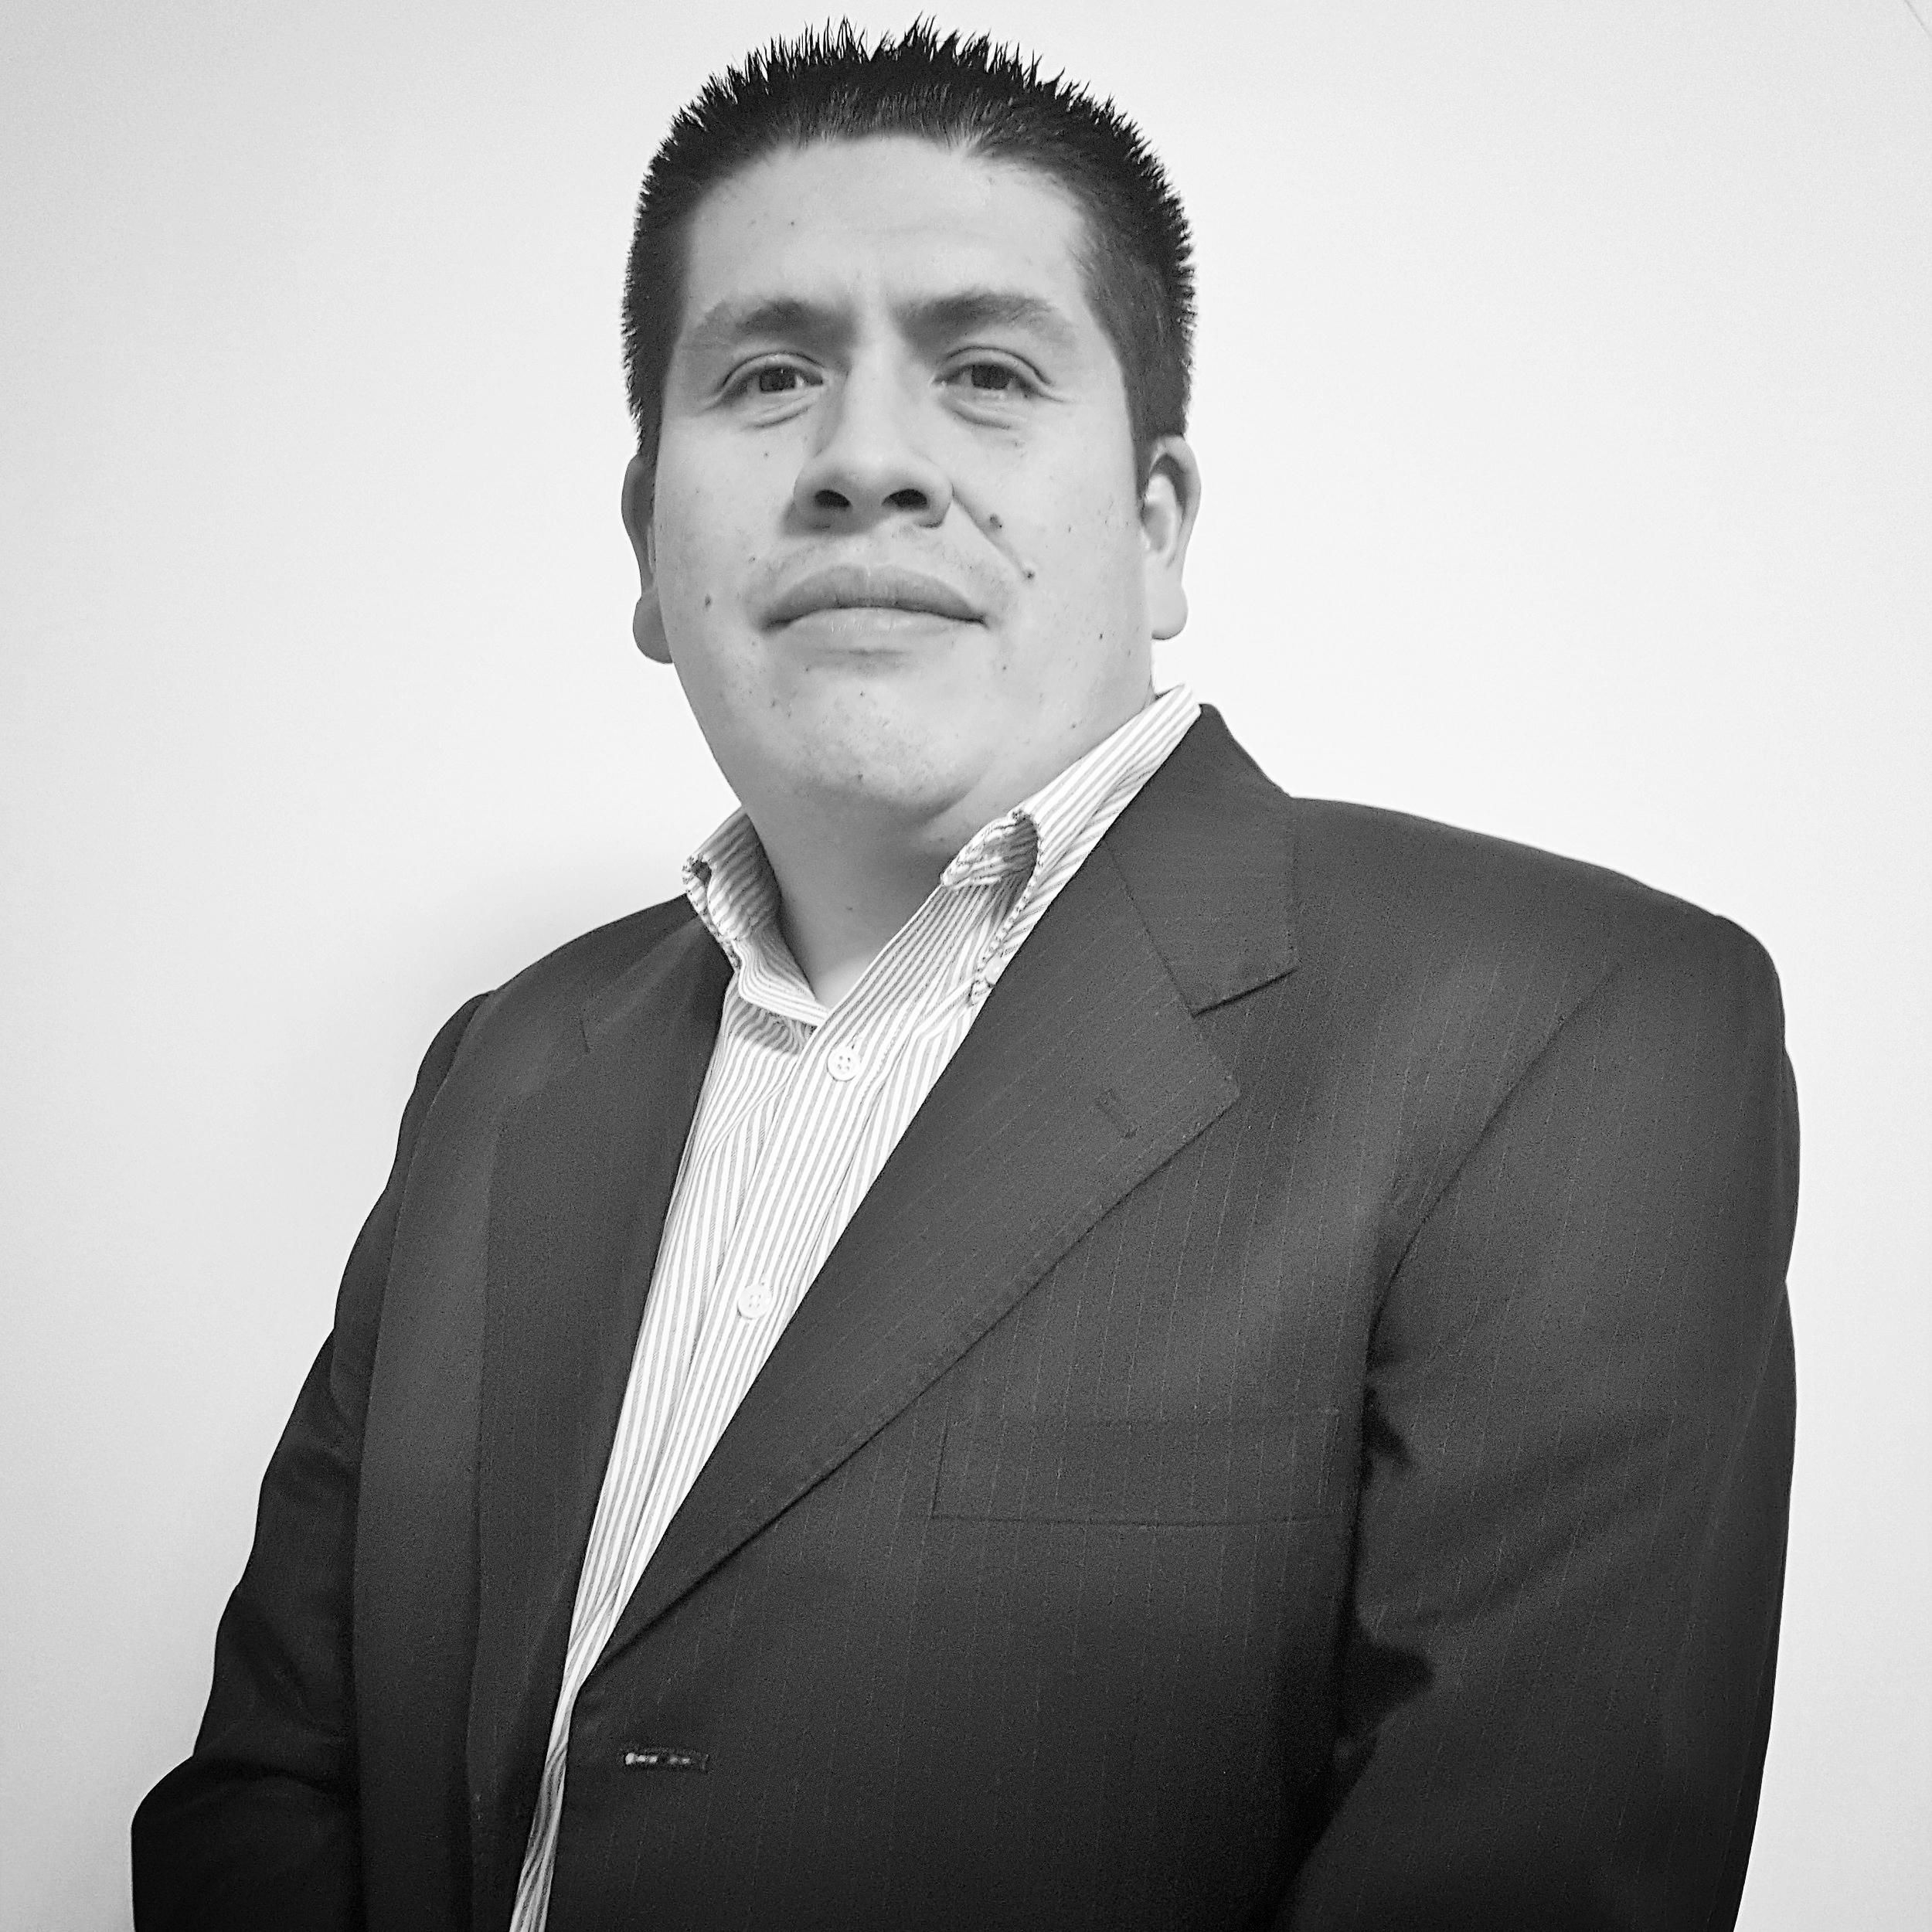 Raul Moreno Director Latin America, Spain & Portugal, Firefly AB